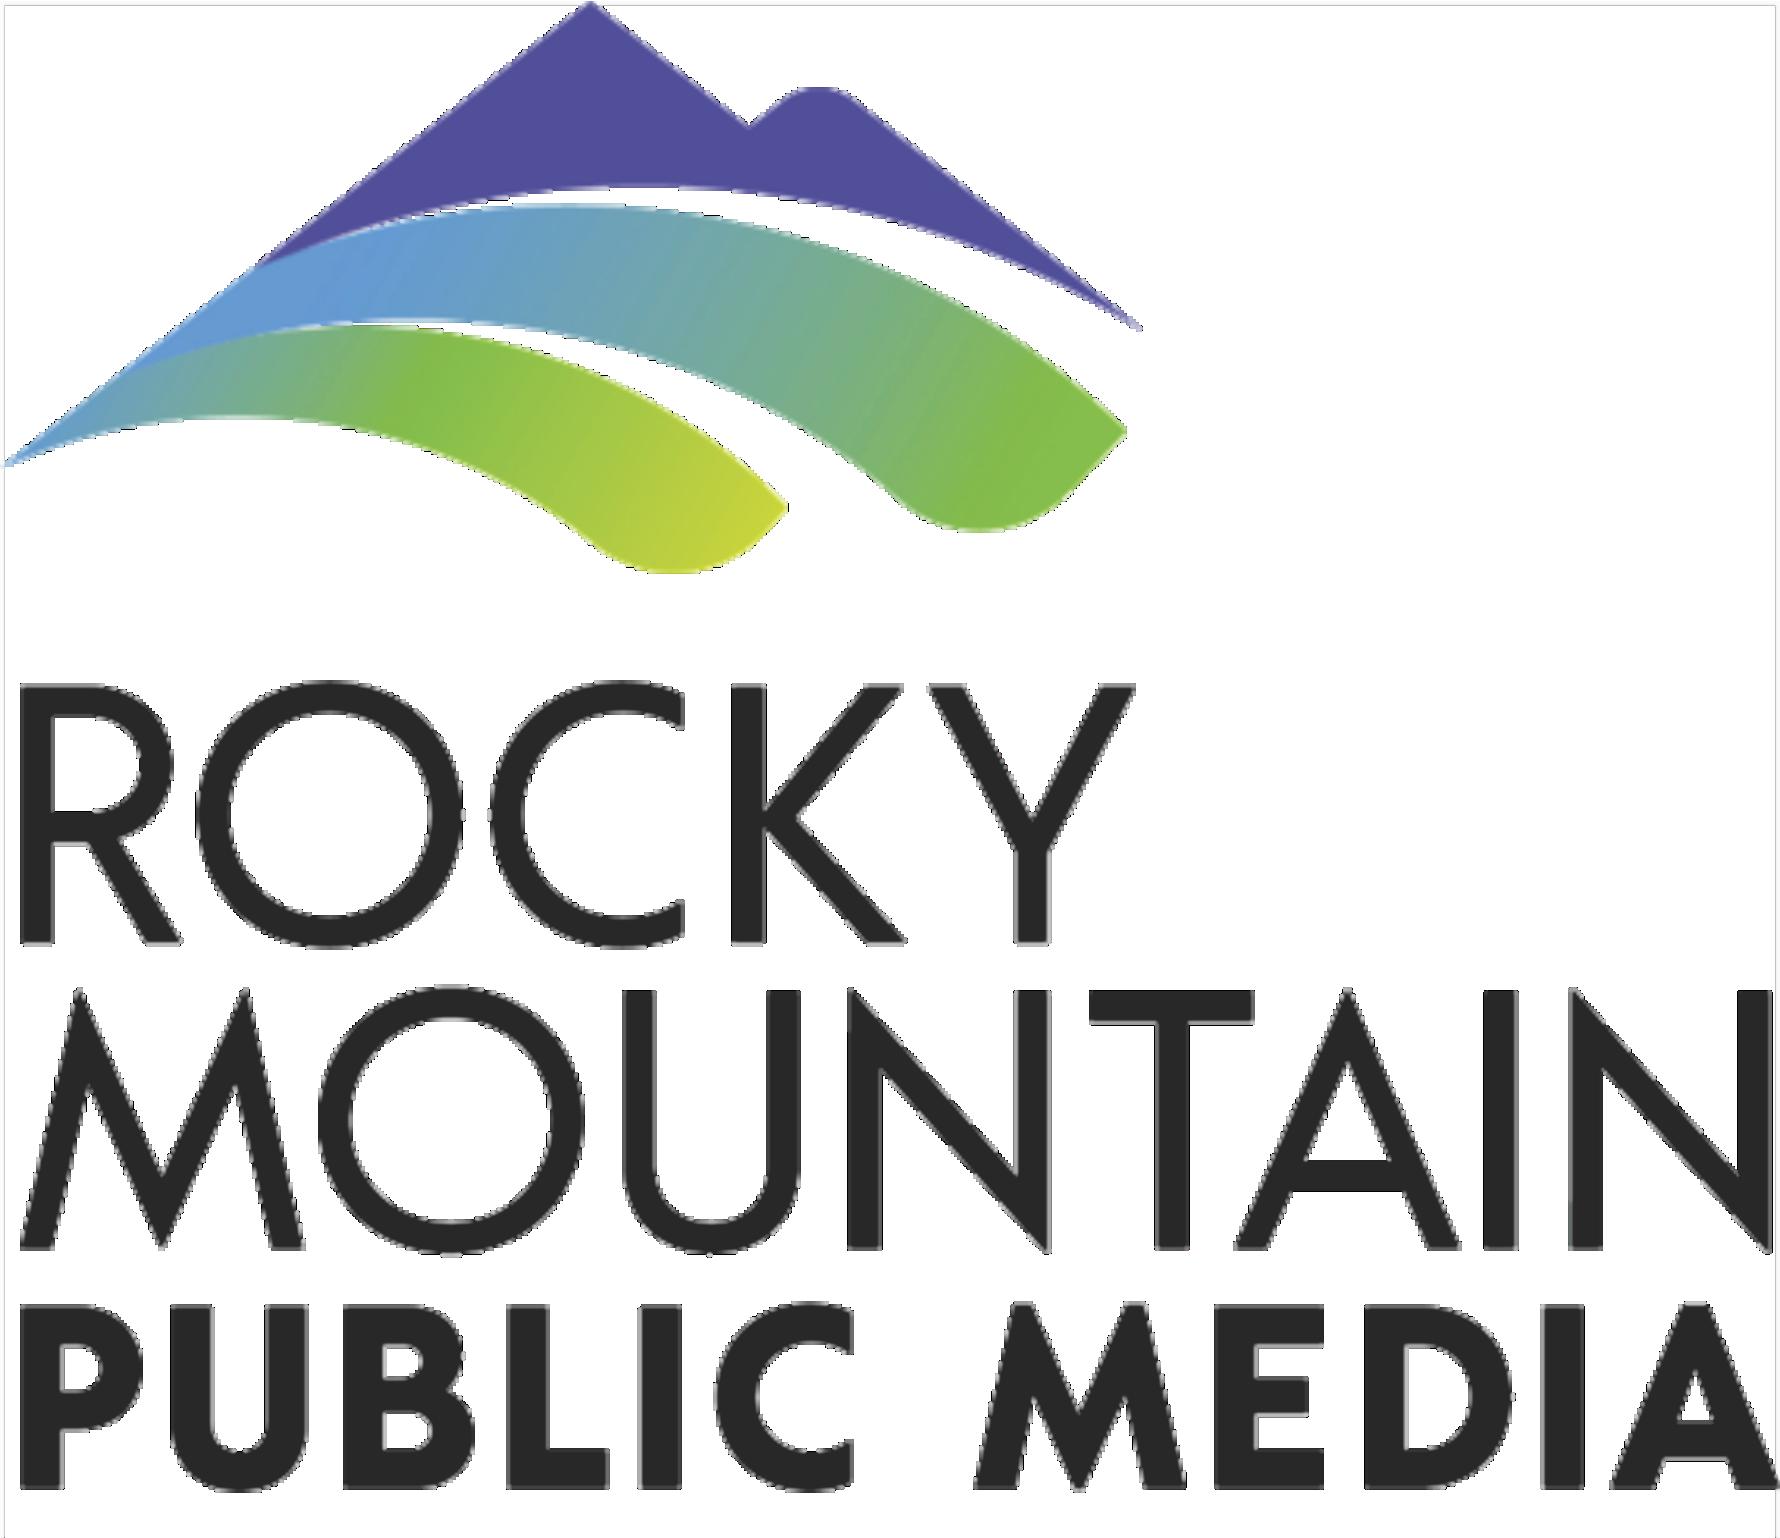 rocky mountain public media logo.png